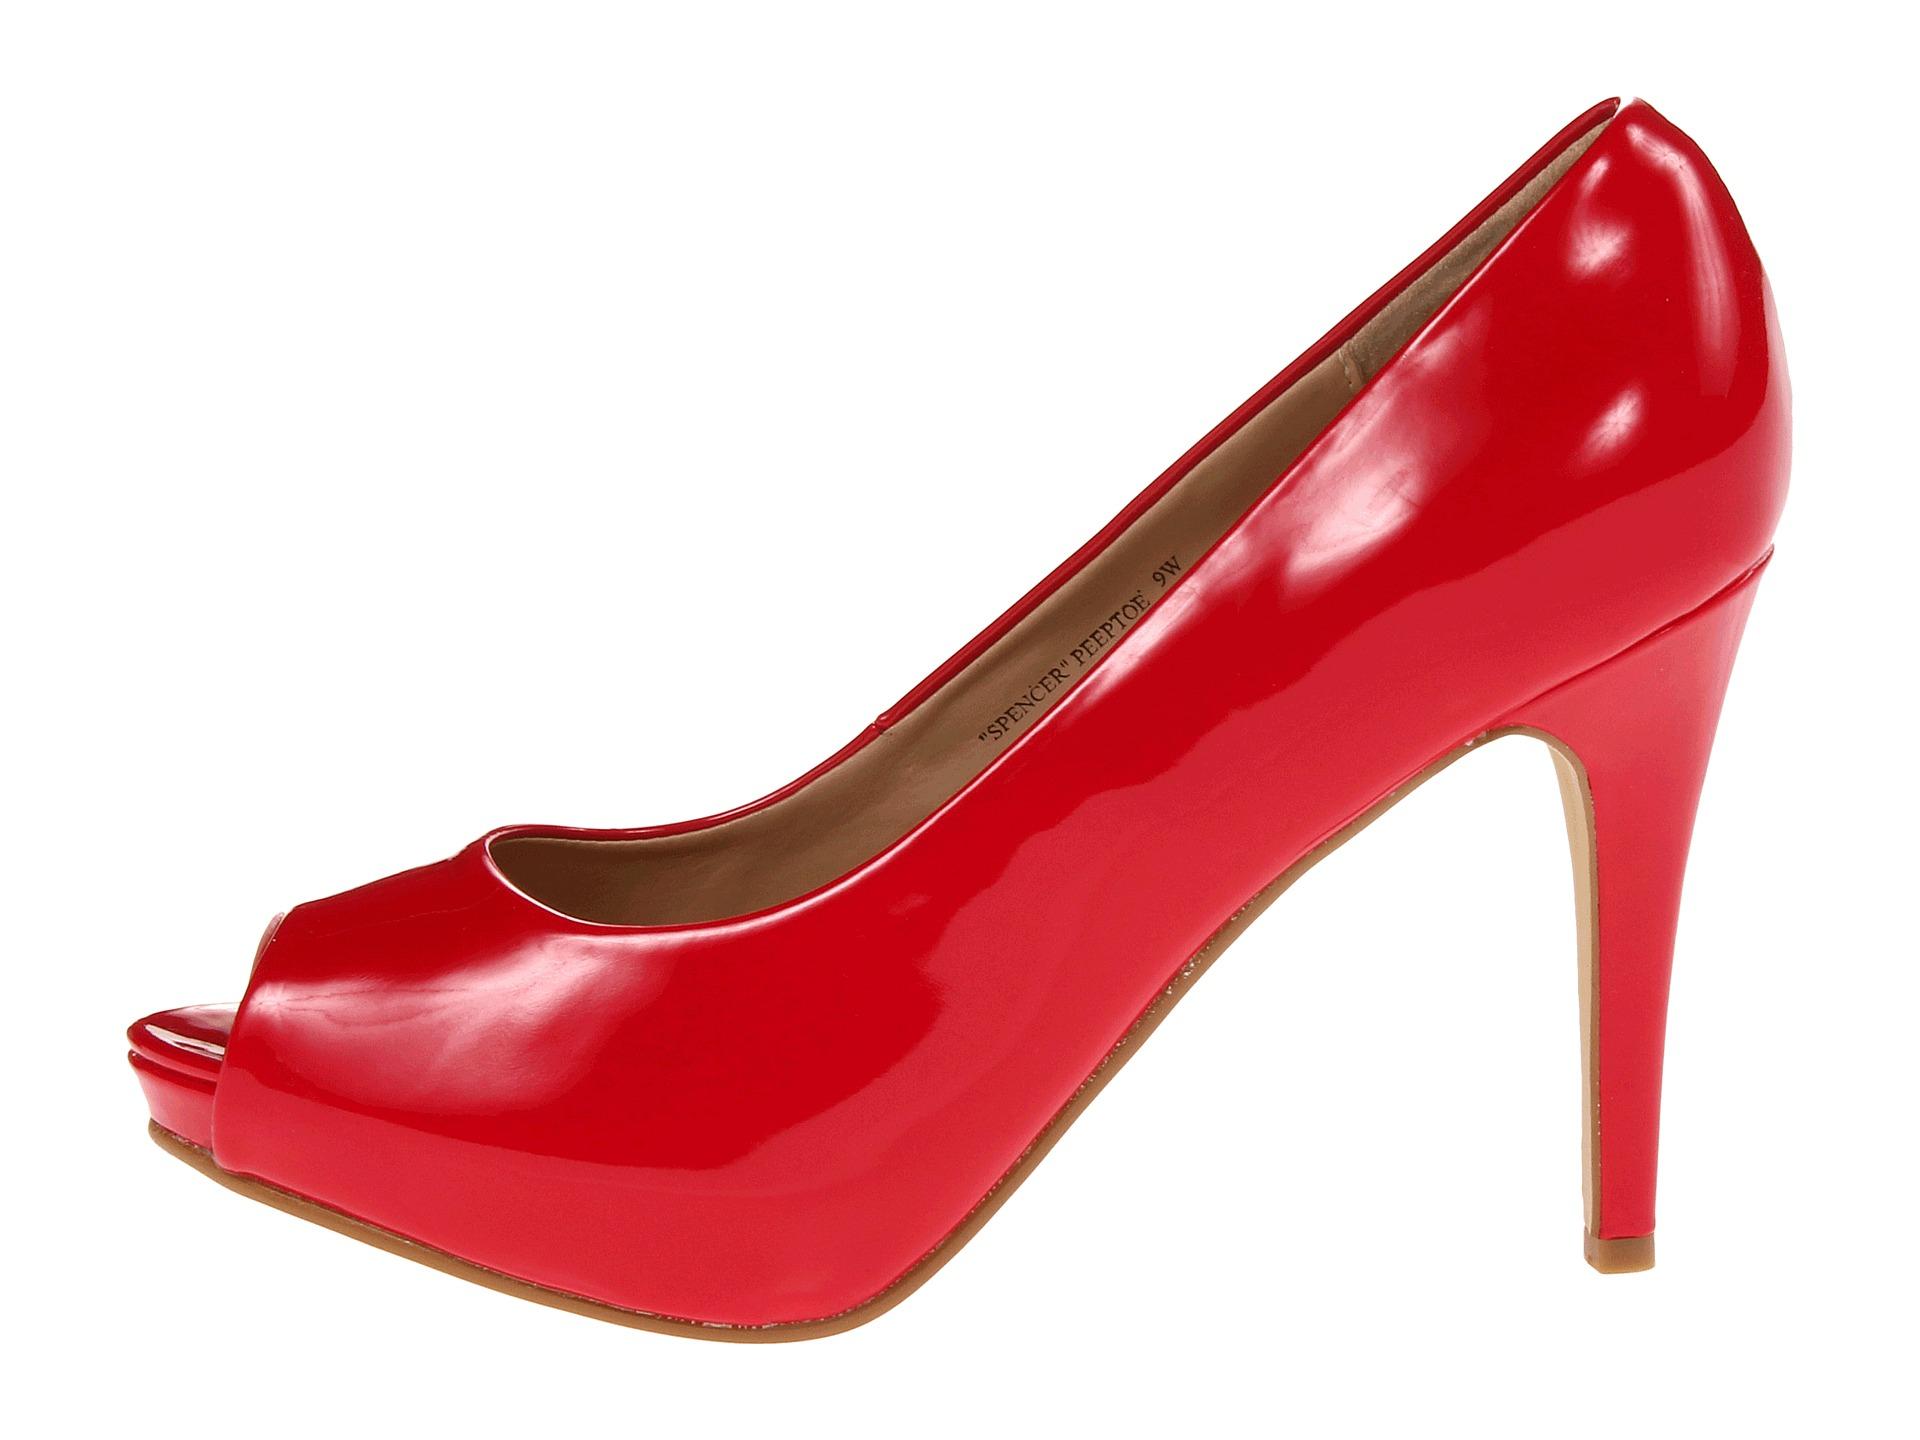 980243c9c59f Lyst - Rsvp Spencer Peep Toe Pump in Red